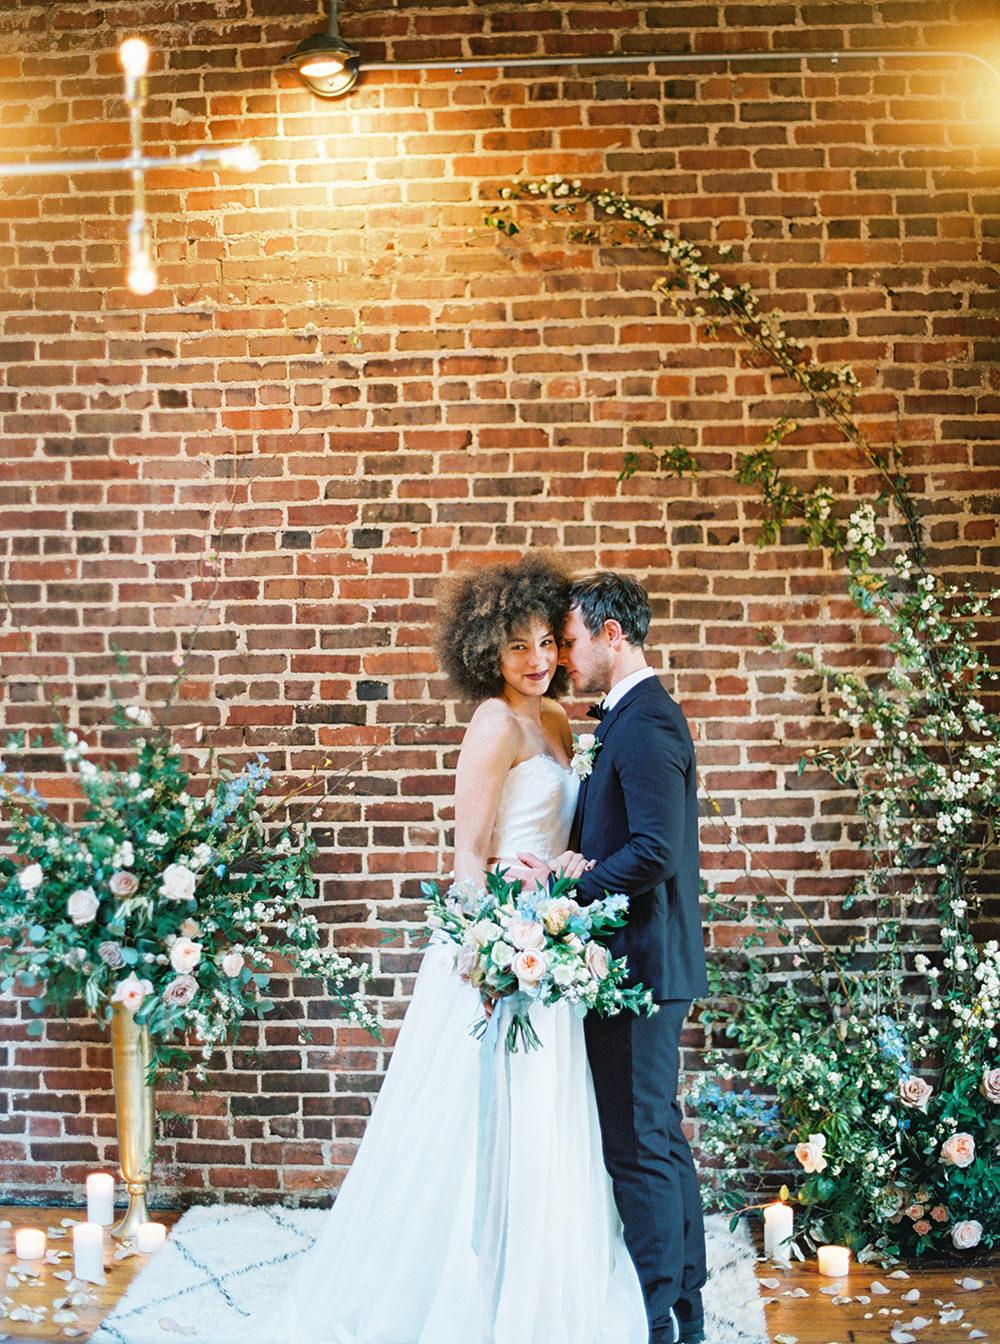 industrial wedding inspiration - photo by Photos by Heart http://ruffledblog.com/downtown-birmingham-spring-wedding-inspiration